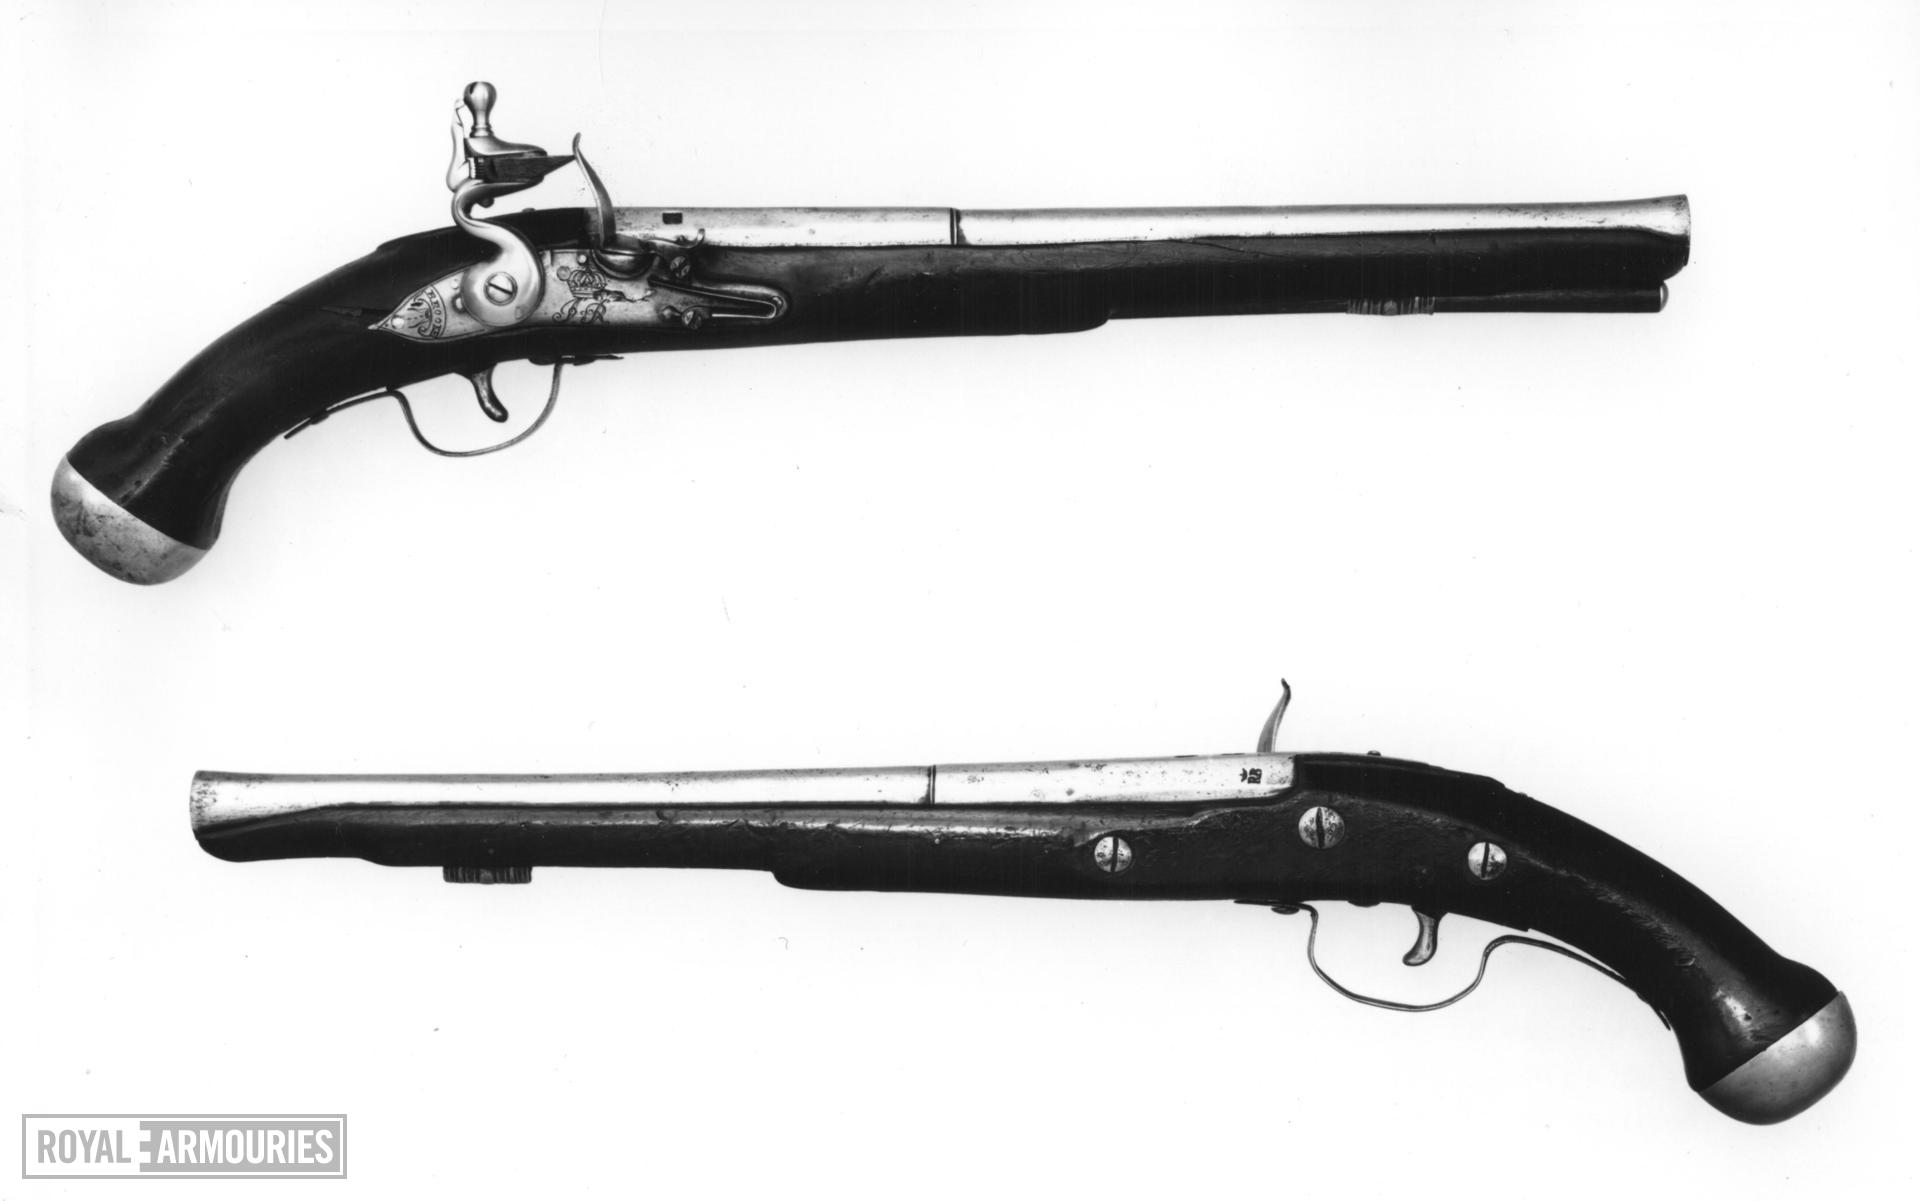 Flintlock holster pistol - Service Type